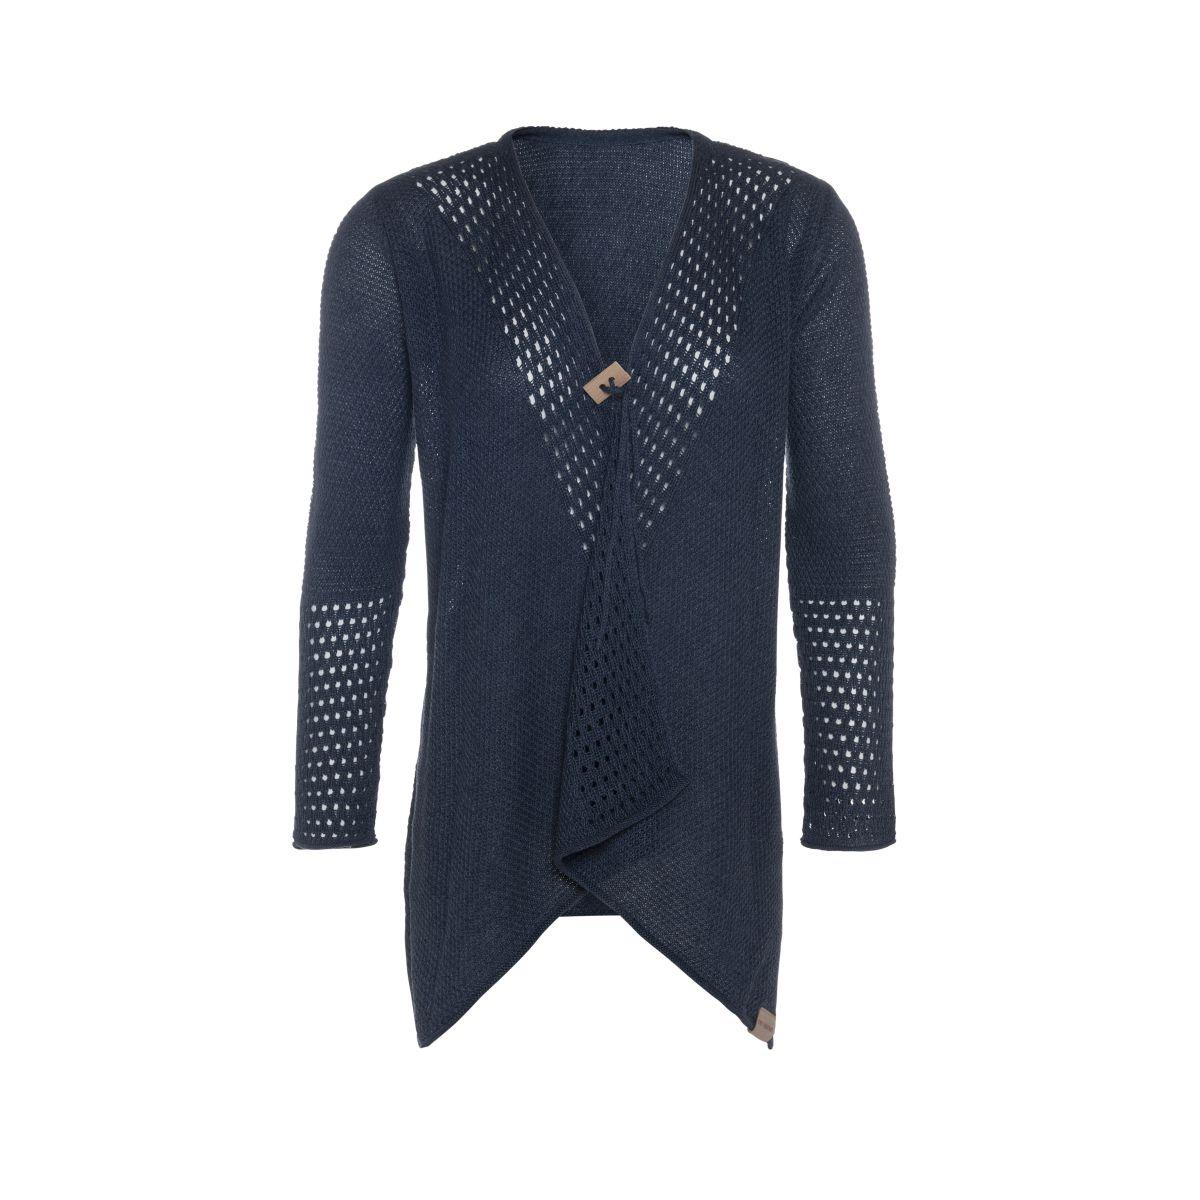 knit factory kf15208100751 april vest denim 4042 1